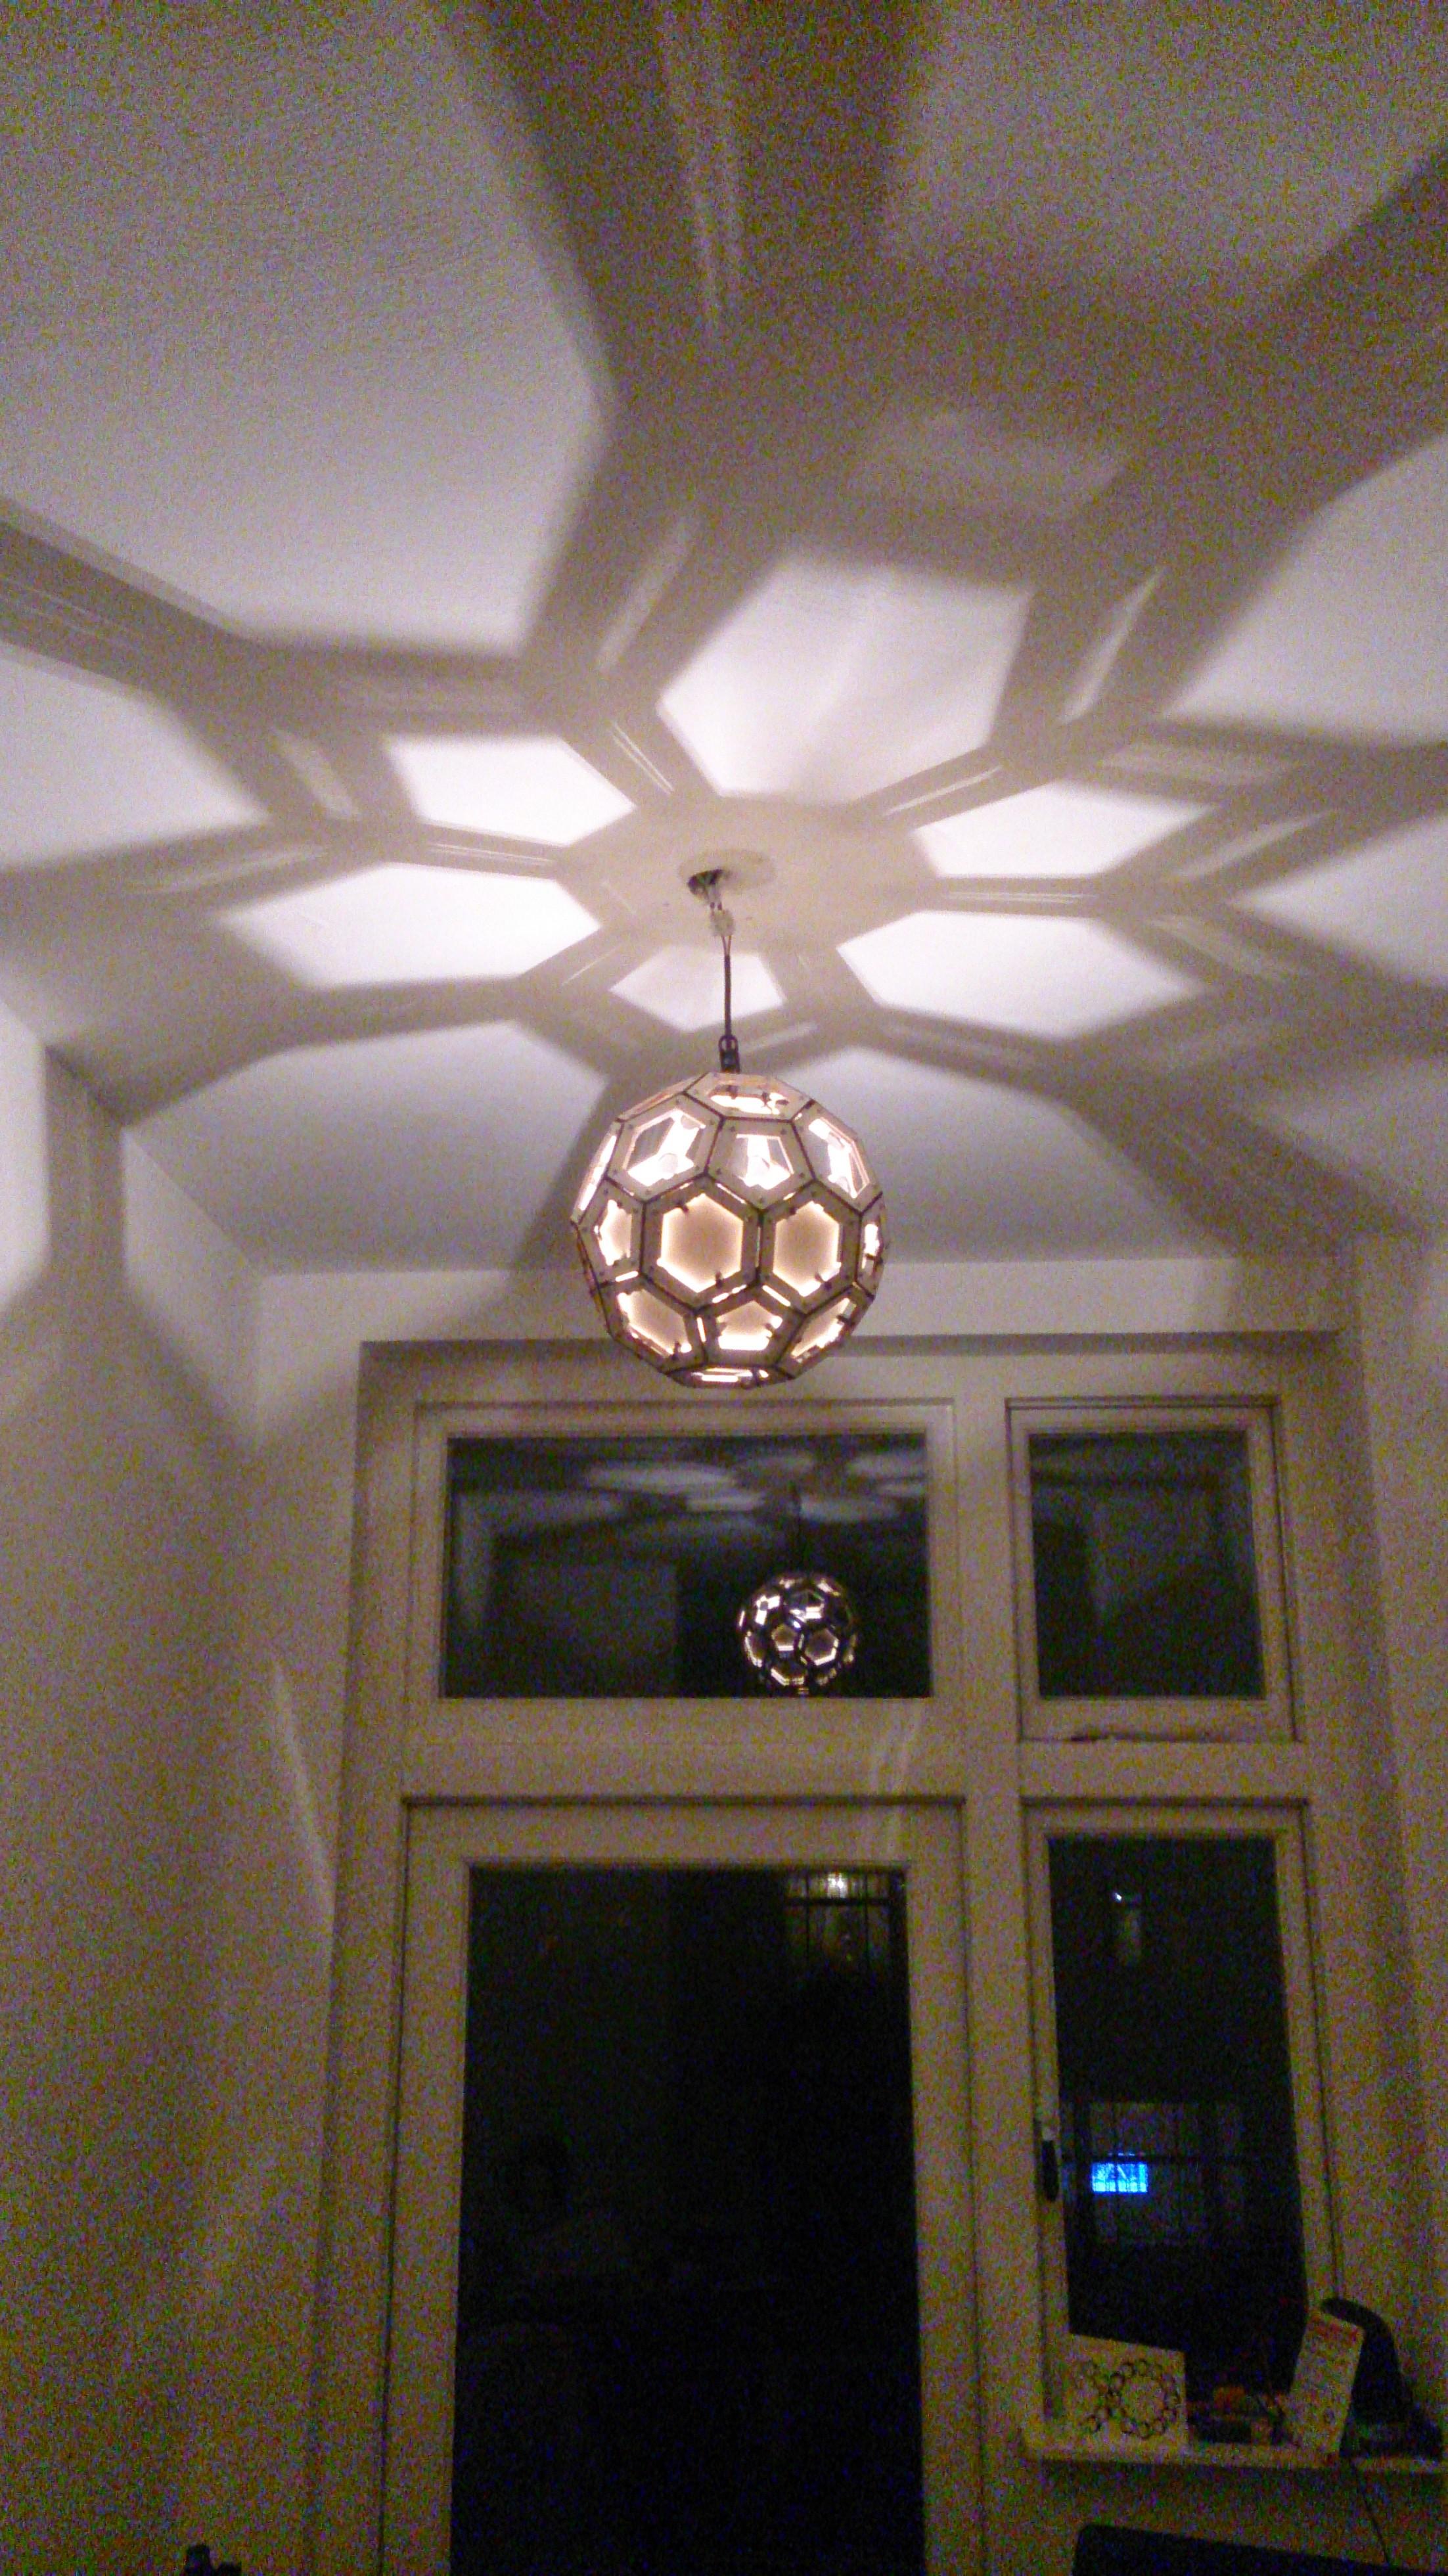 Lasercut and 3d-printed Truncated Icosahedron lamp-shade